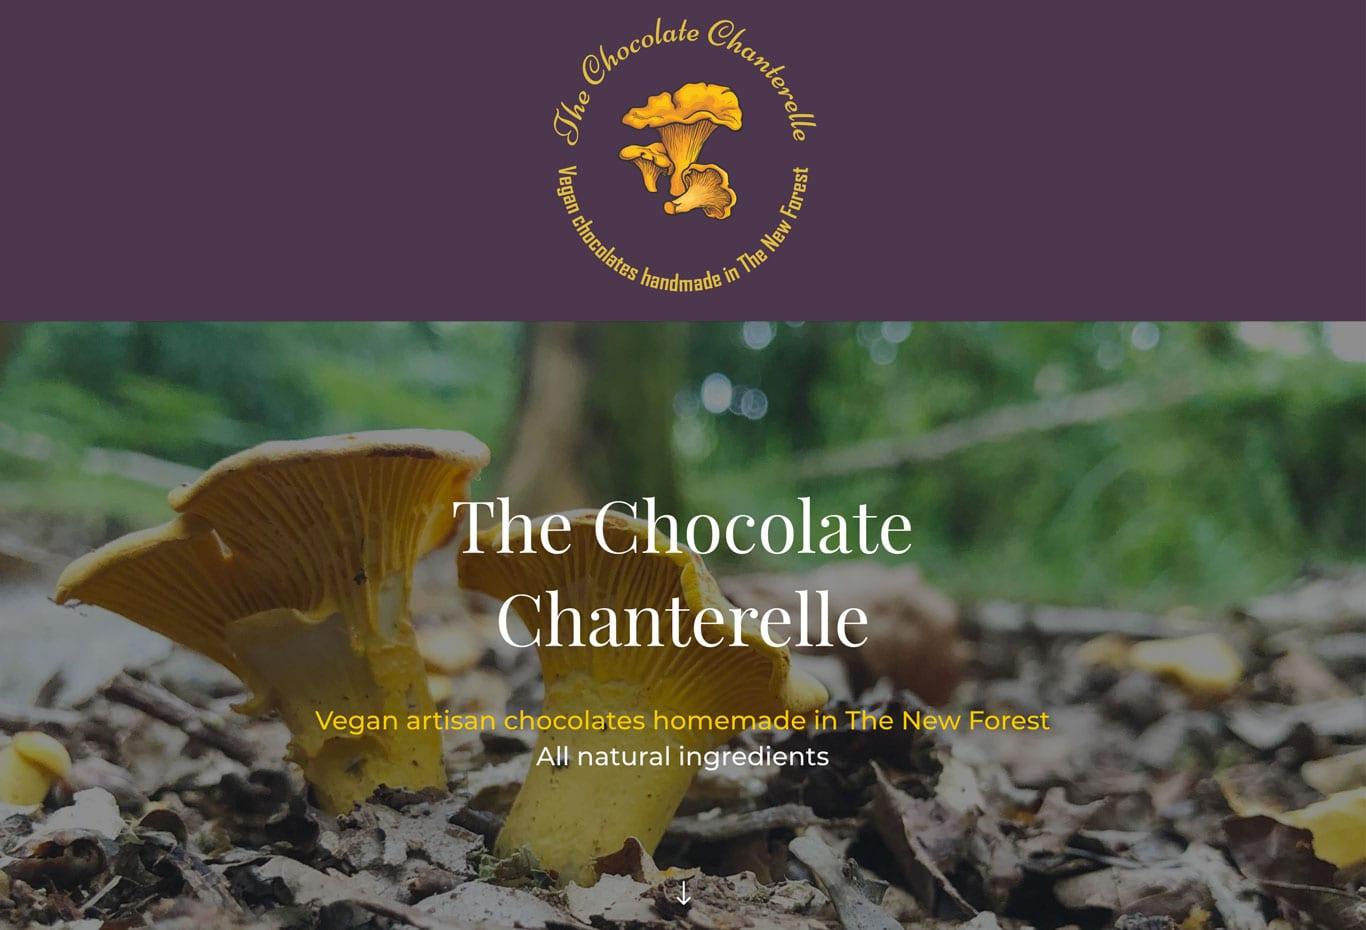 The Chocolate Chanterelle